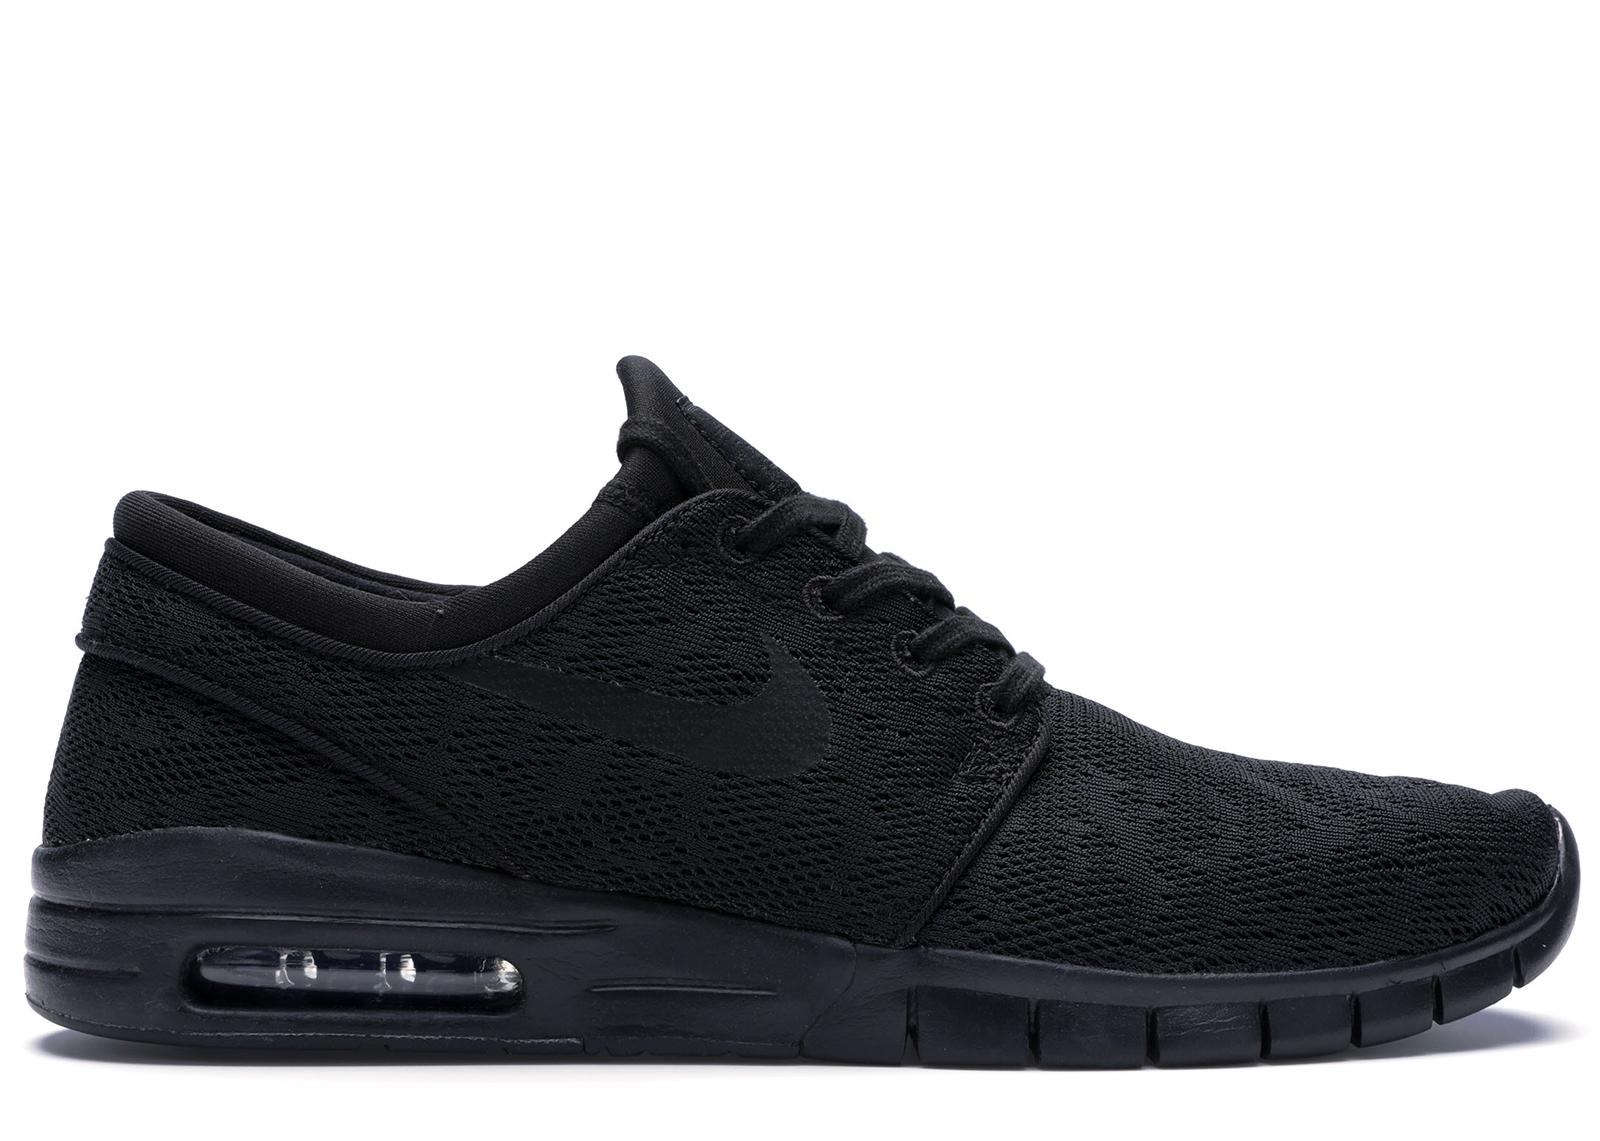 Buy Nike SB Janoski Shoes & Deadstock Sneakers